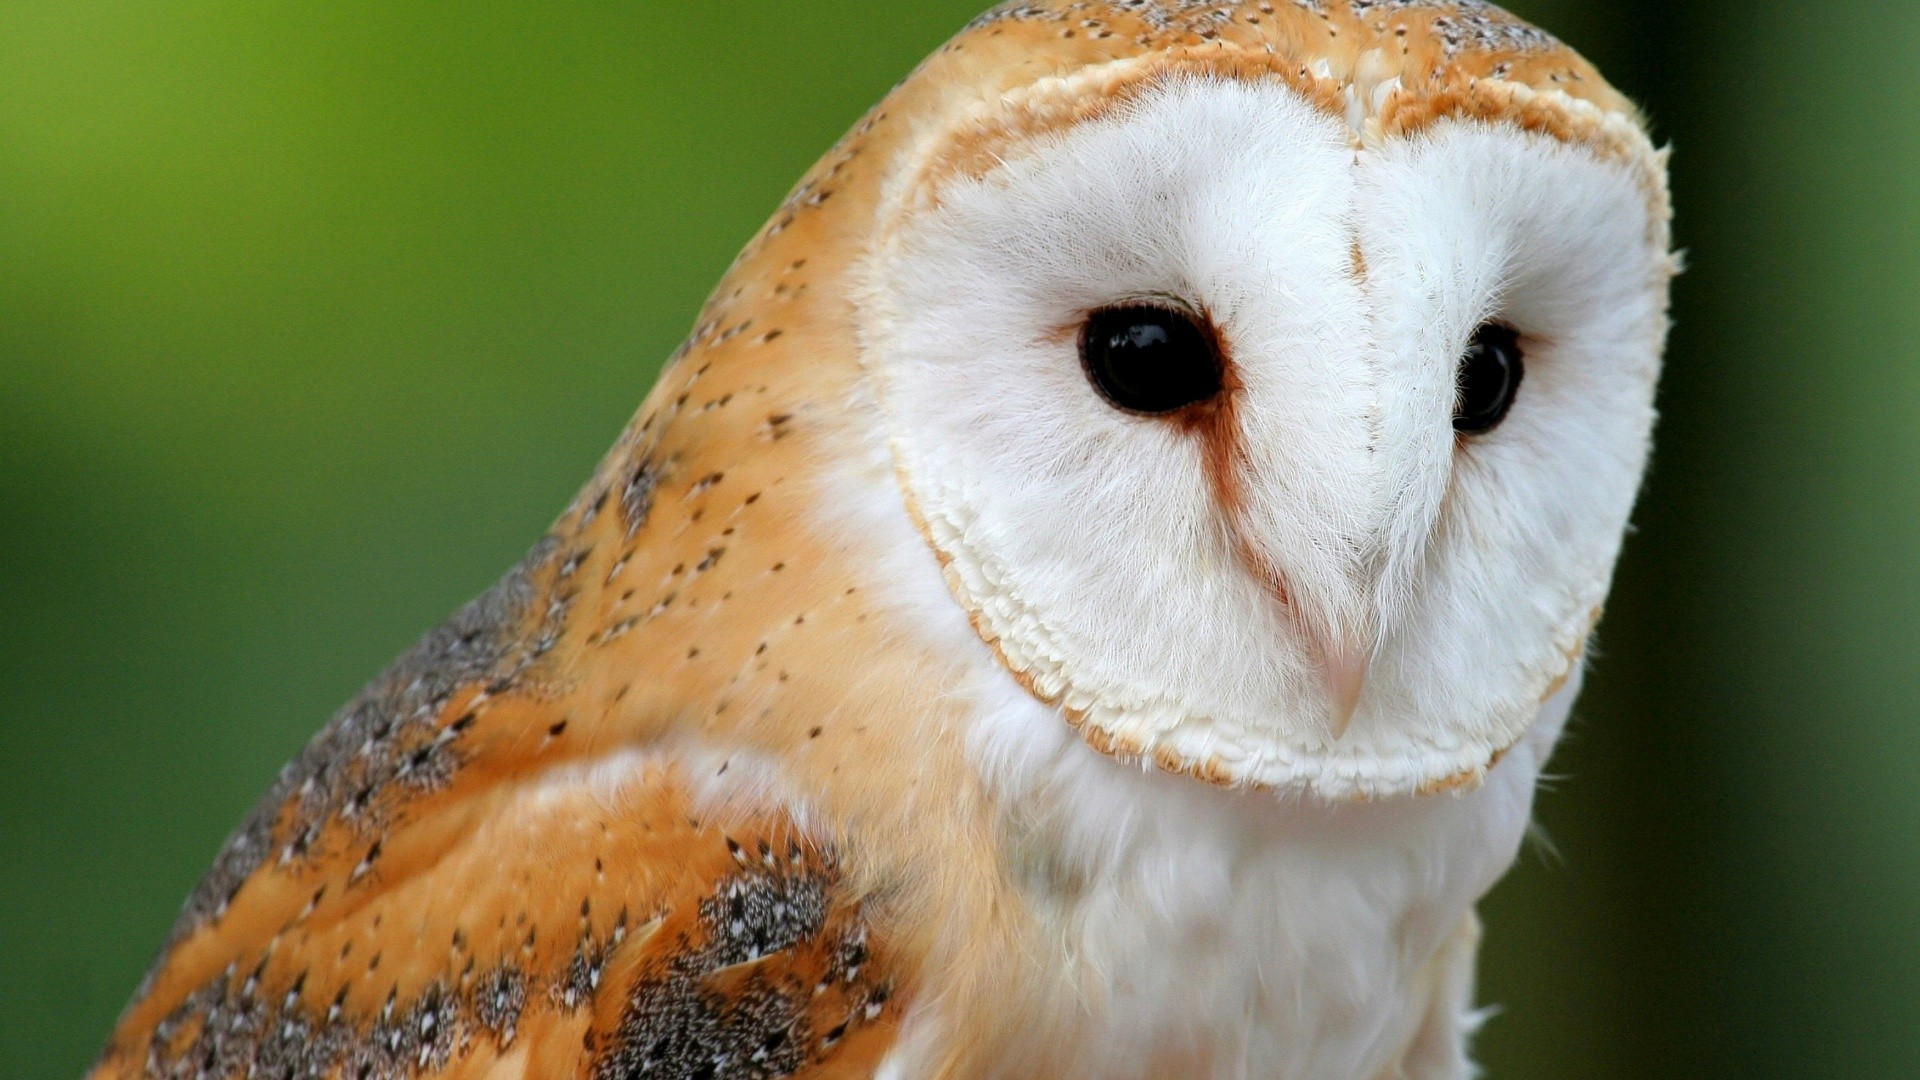 Barn Owl Wallpapers